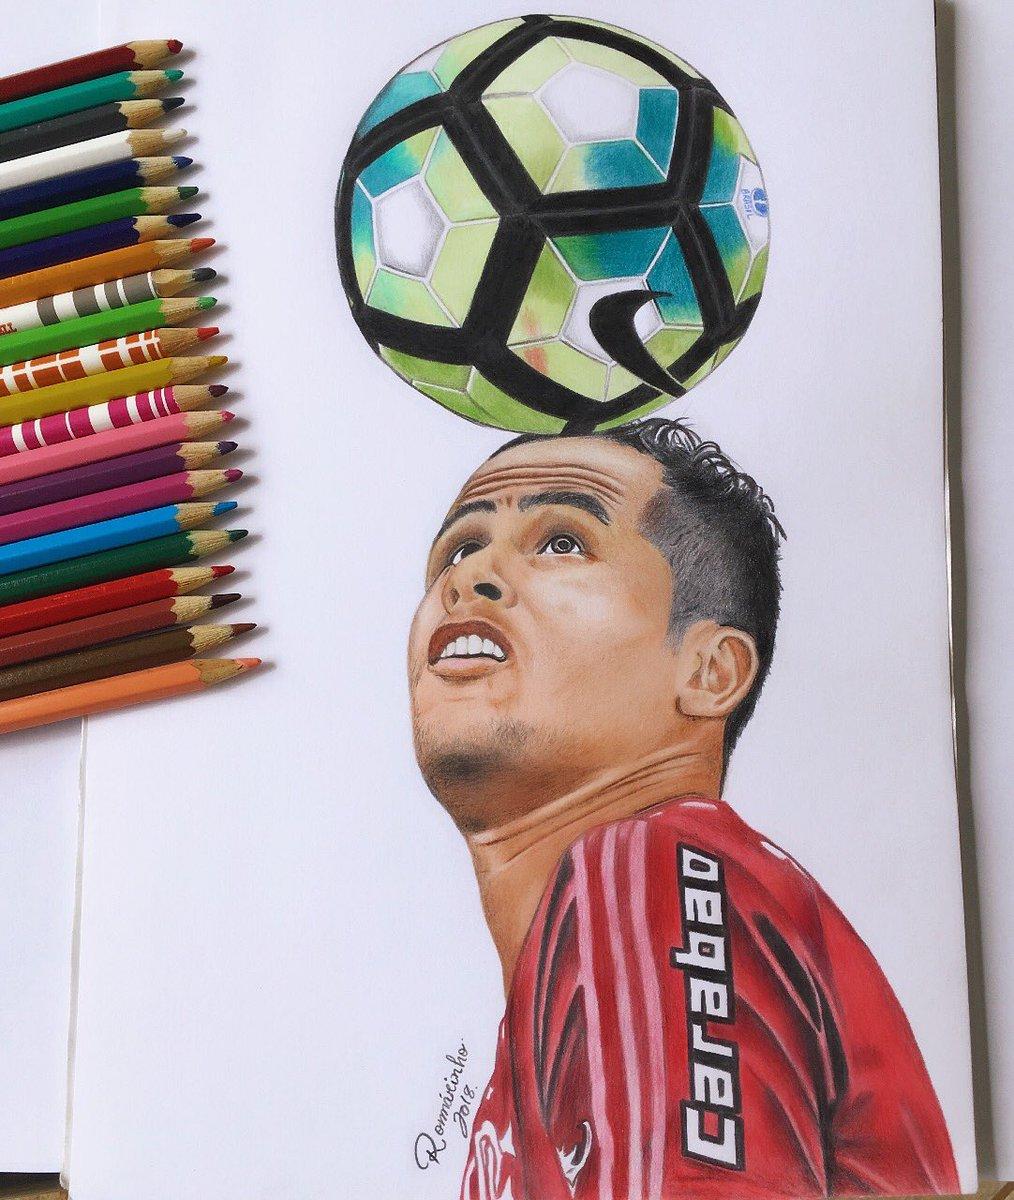 Romárinho Art On Twitter Desenho Finalizado